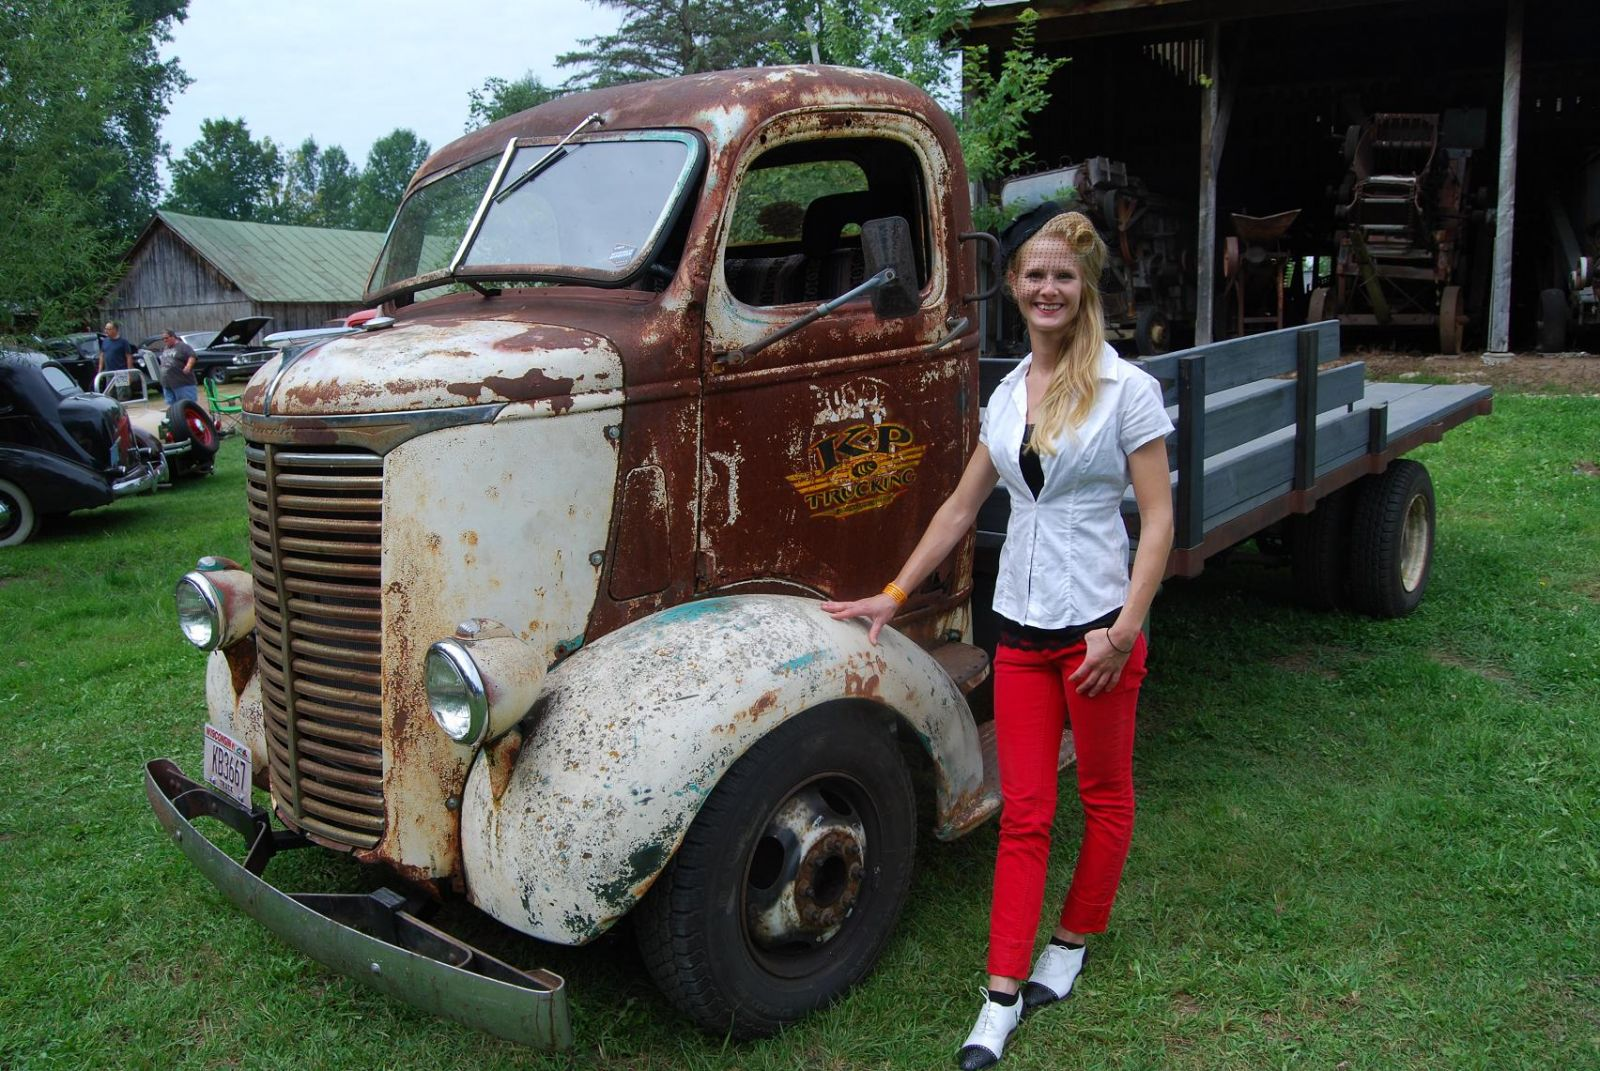 Snub-nosed Trucks Make Cool Hot Rods | Hotrod Hotline